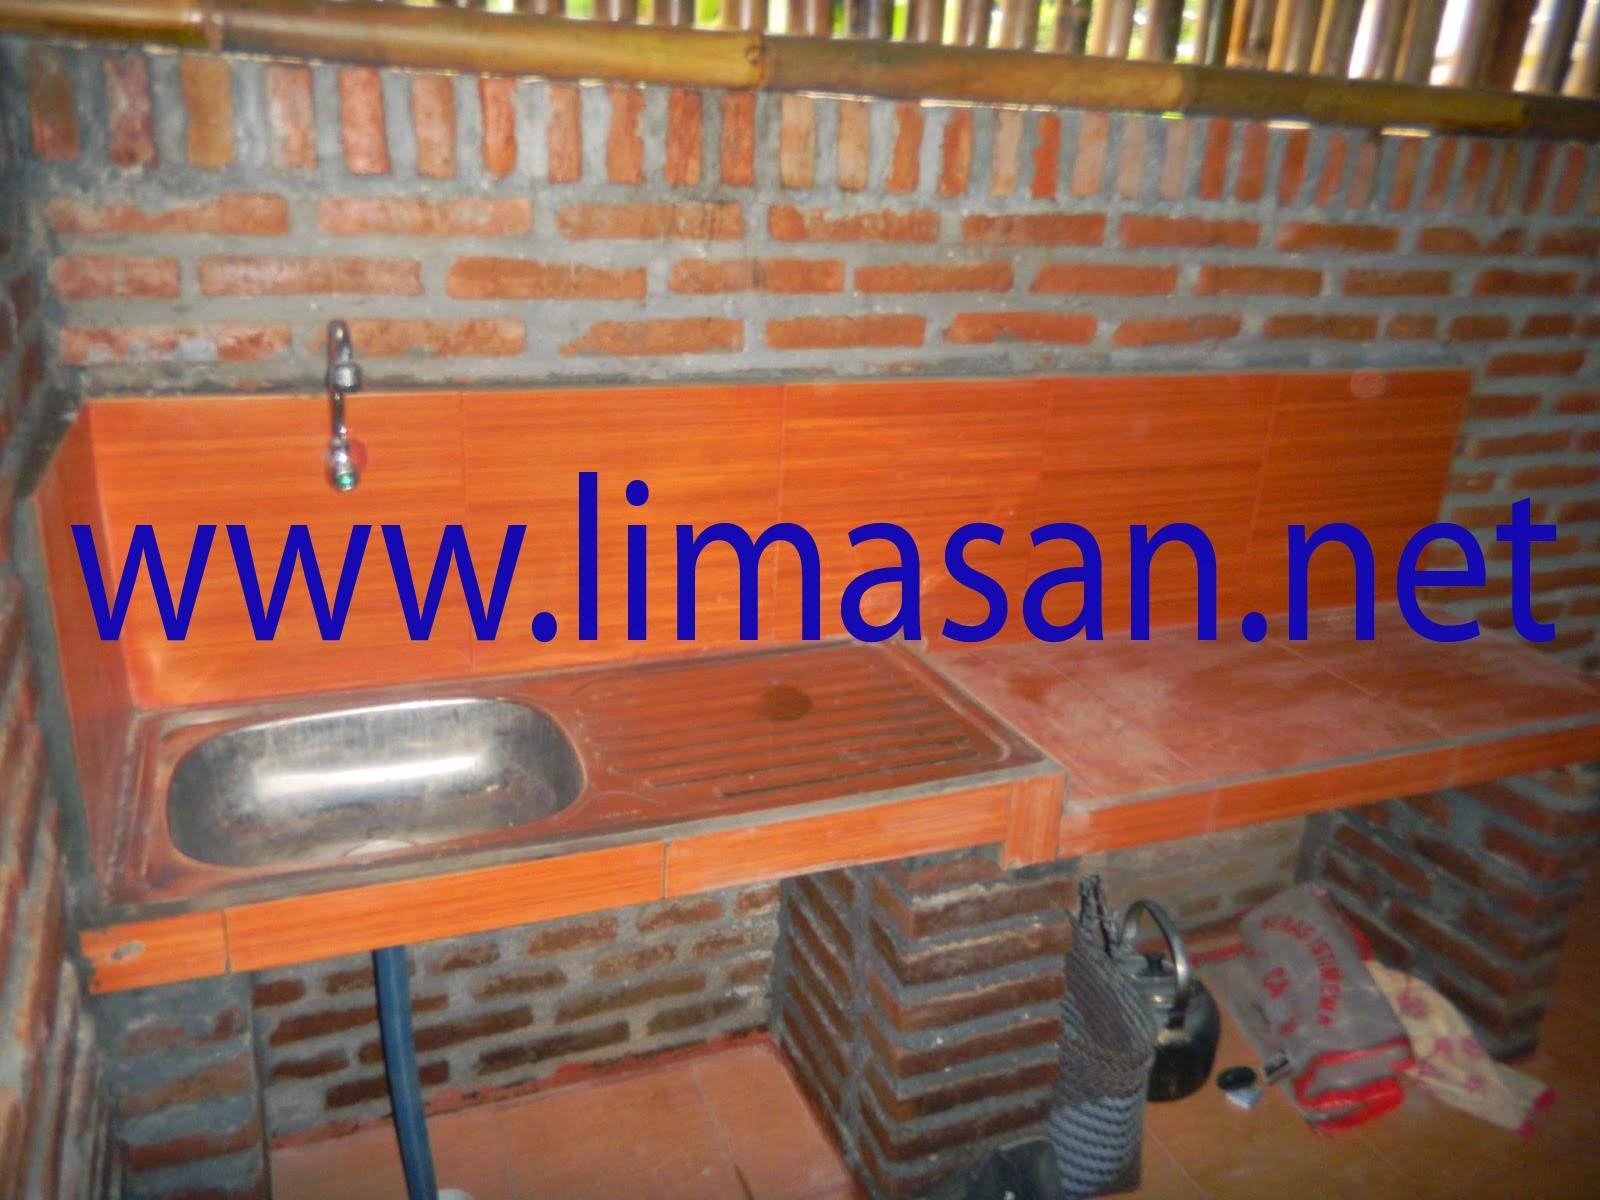 Rumah Limasan Di Sleman Yogyakarta dapur